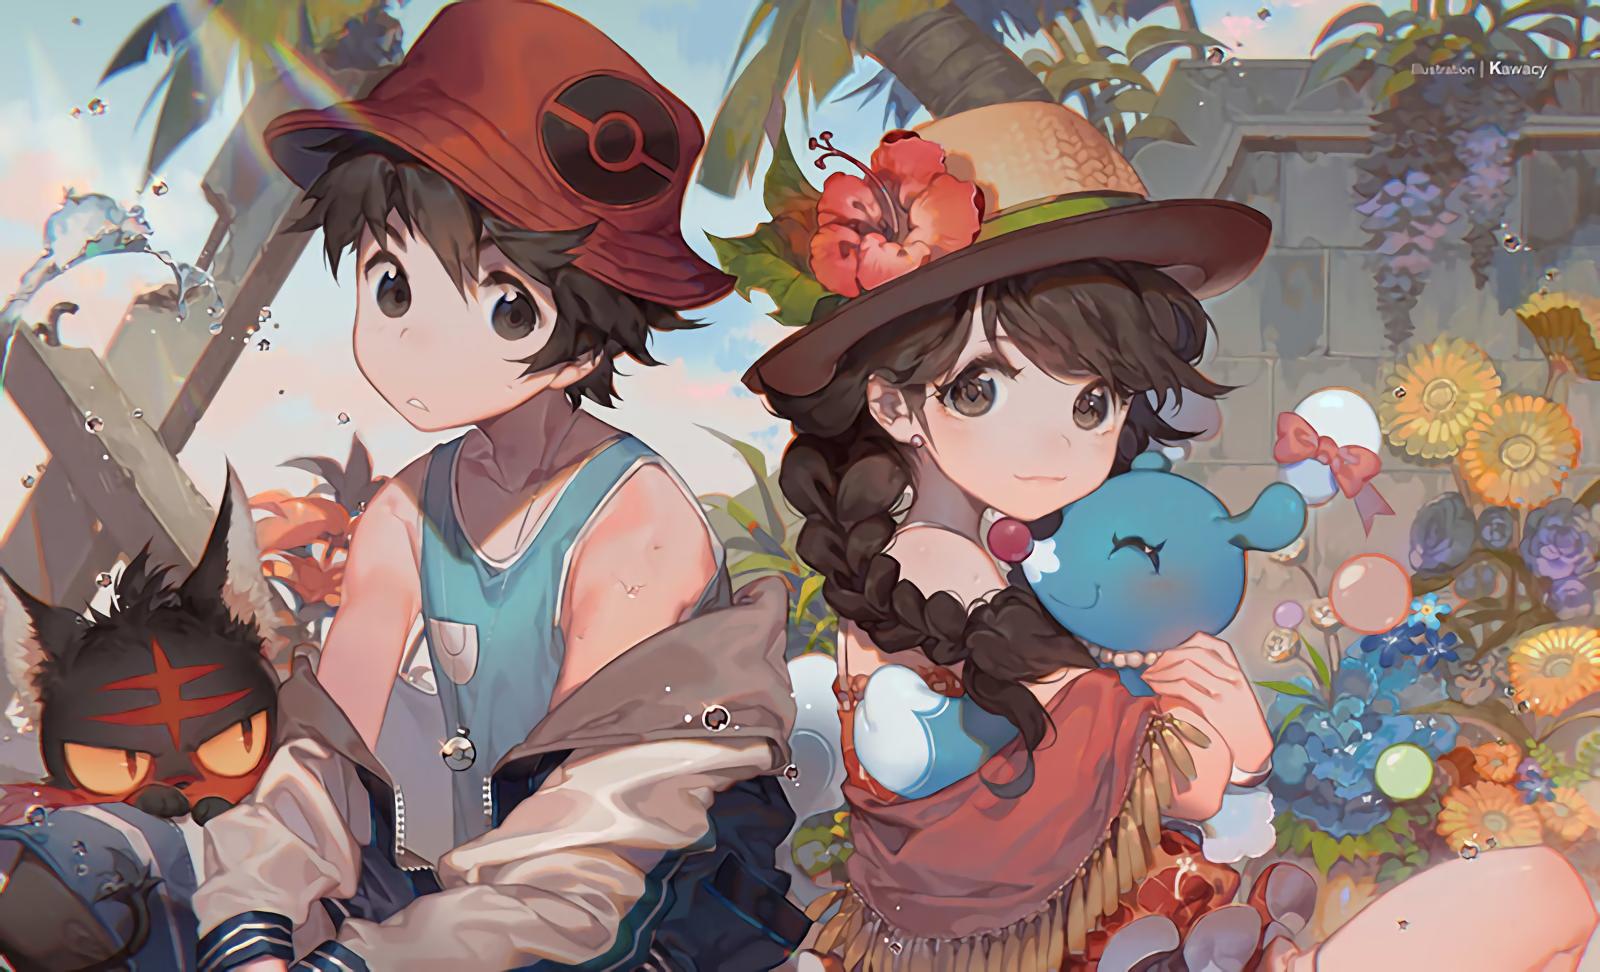 051000005a3523d18b3d055c47092734 1600 972 Pokemon Anime Pokemon Characters